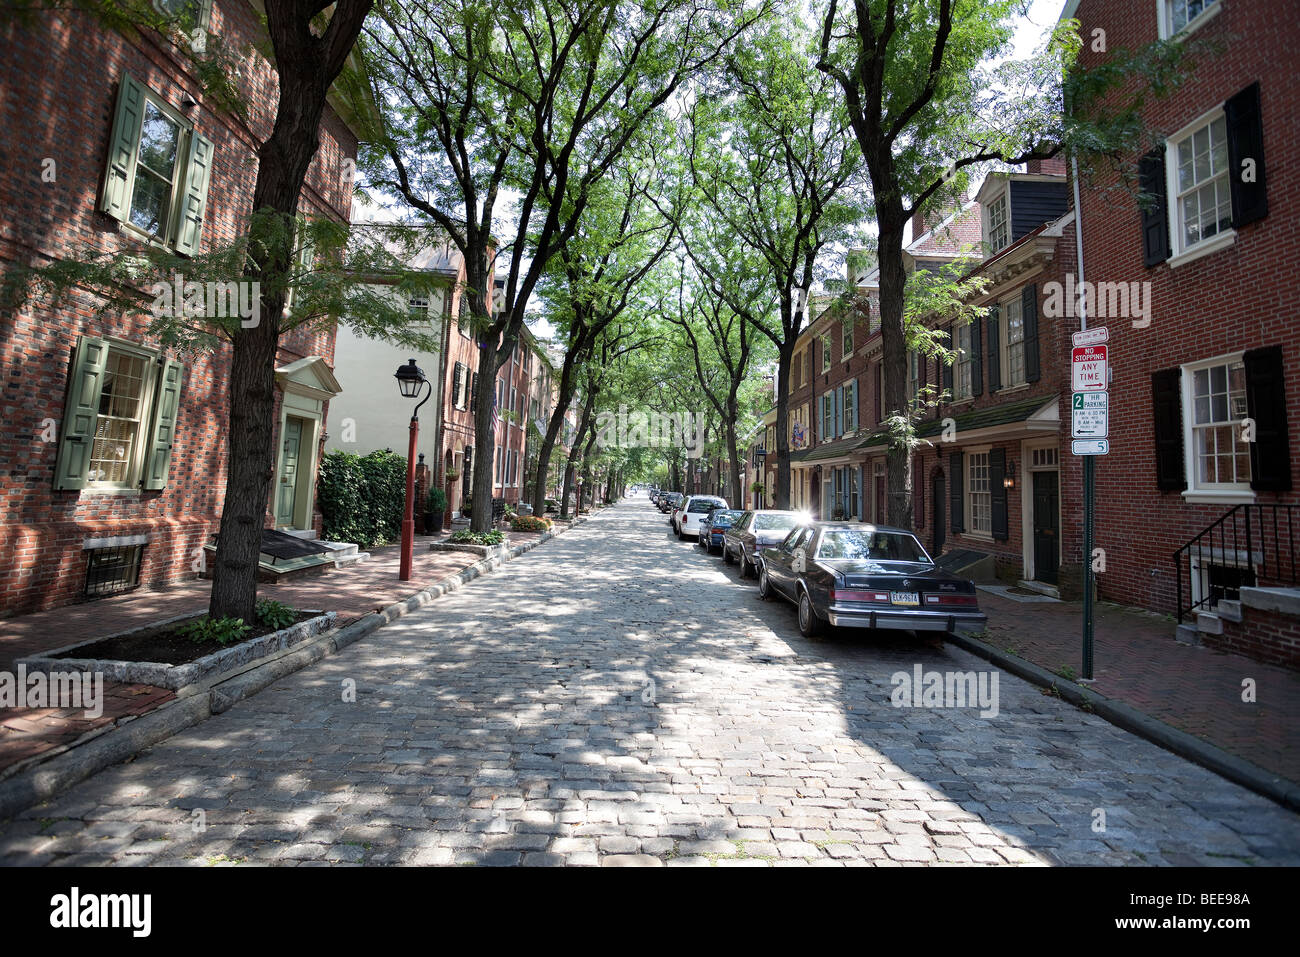 Quartier résidentiel, Philadelphie, Pennsylvanie, PA, USA Photo Stock